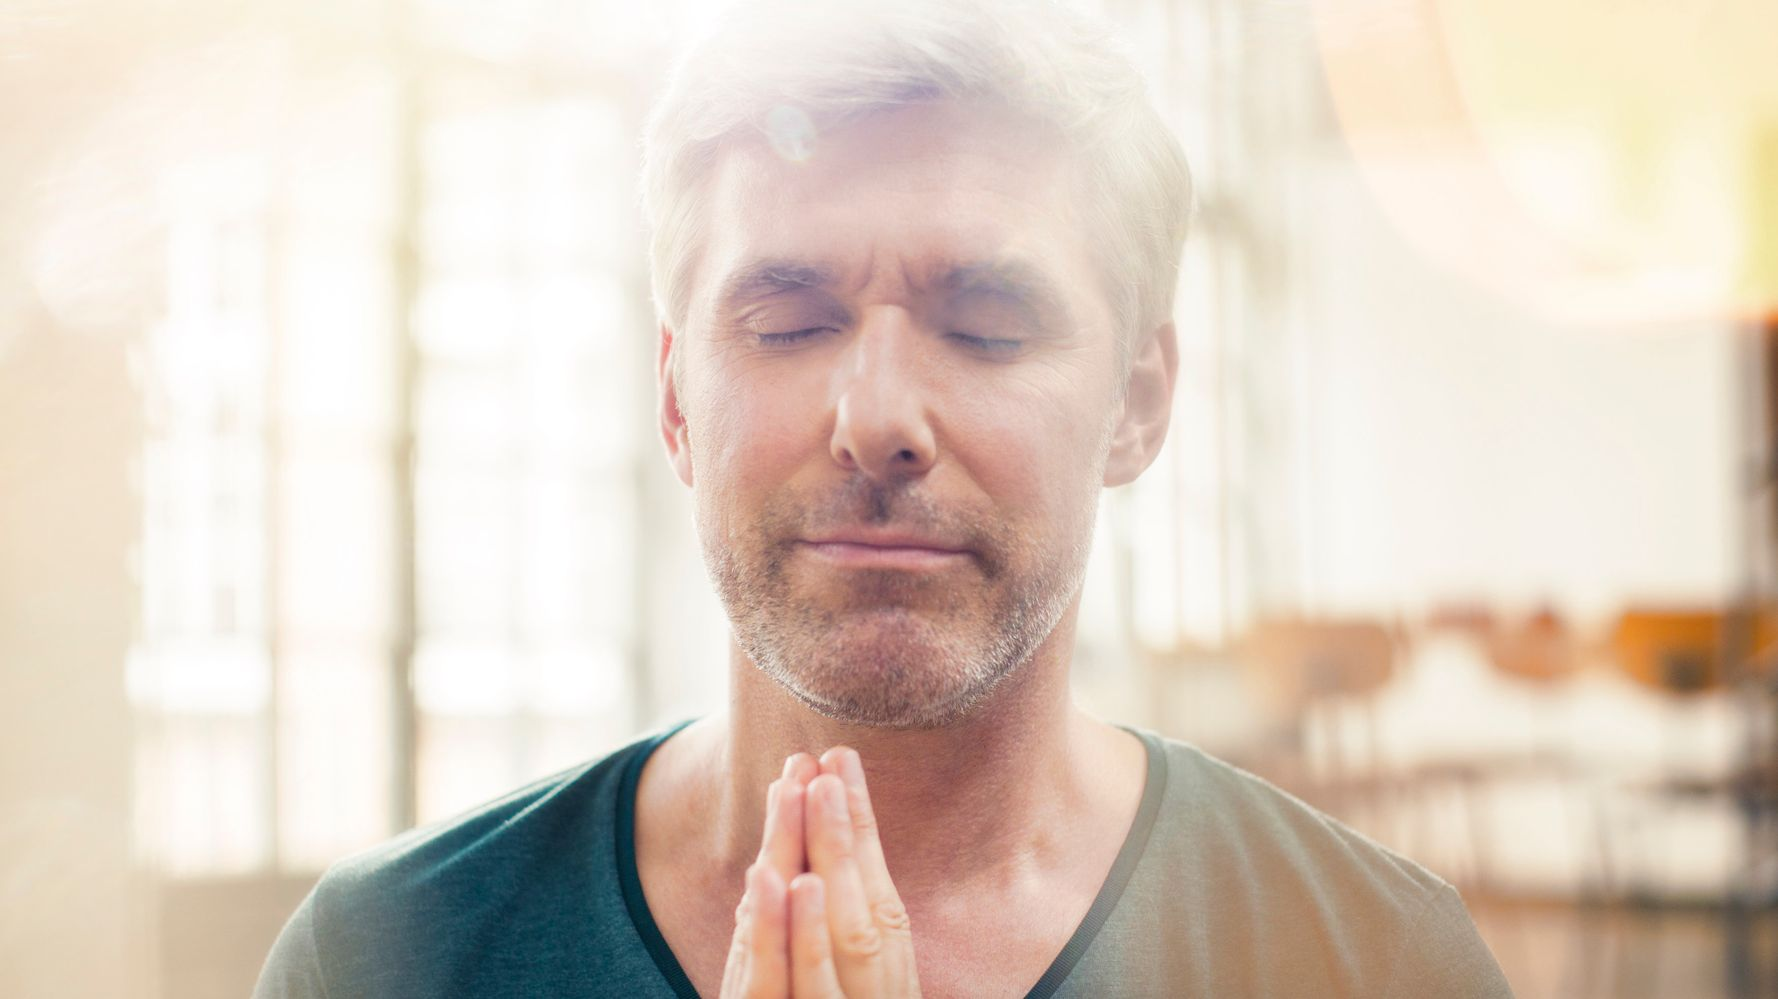 A Scientist Explains How Meditation And Prayer Rewire Your Brain